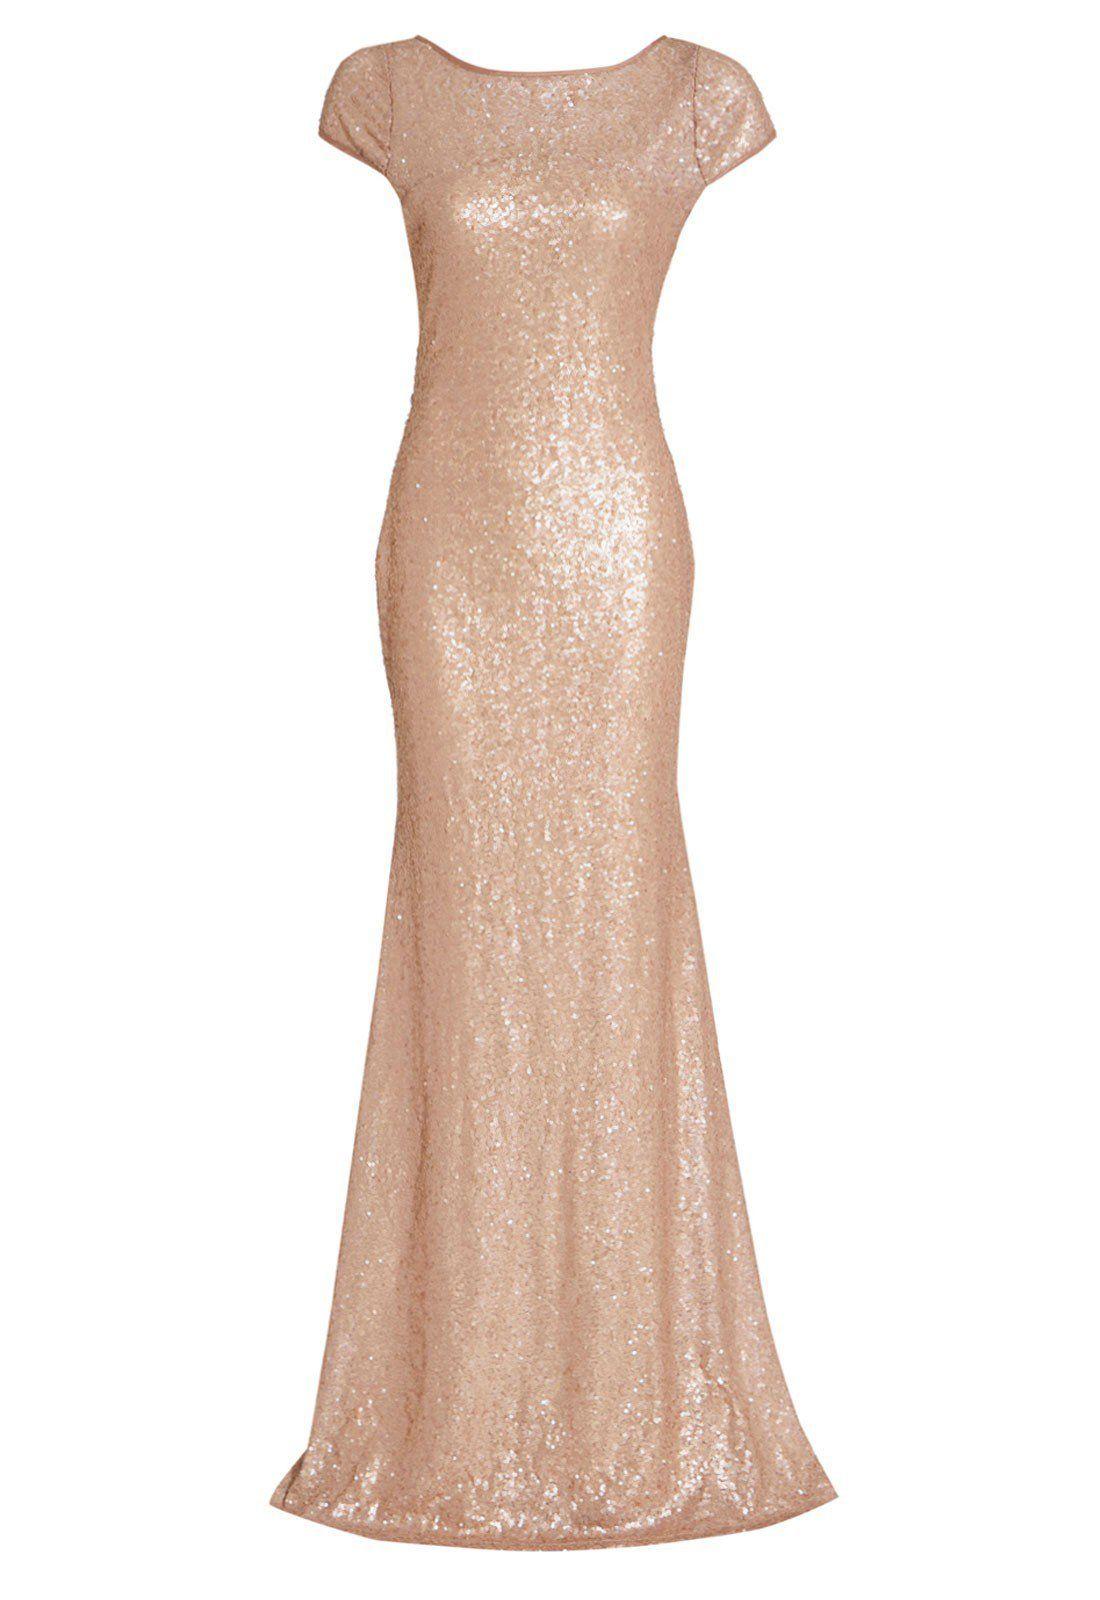 Danna rose gold sequin embellished maxi dress dark smokey eye